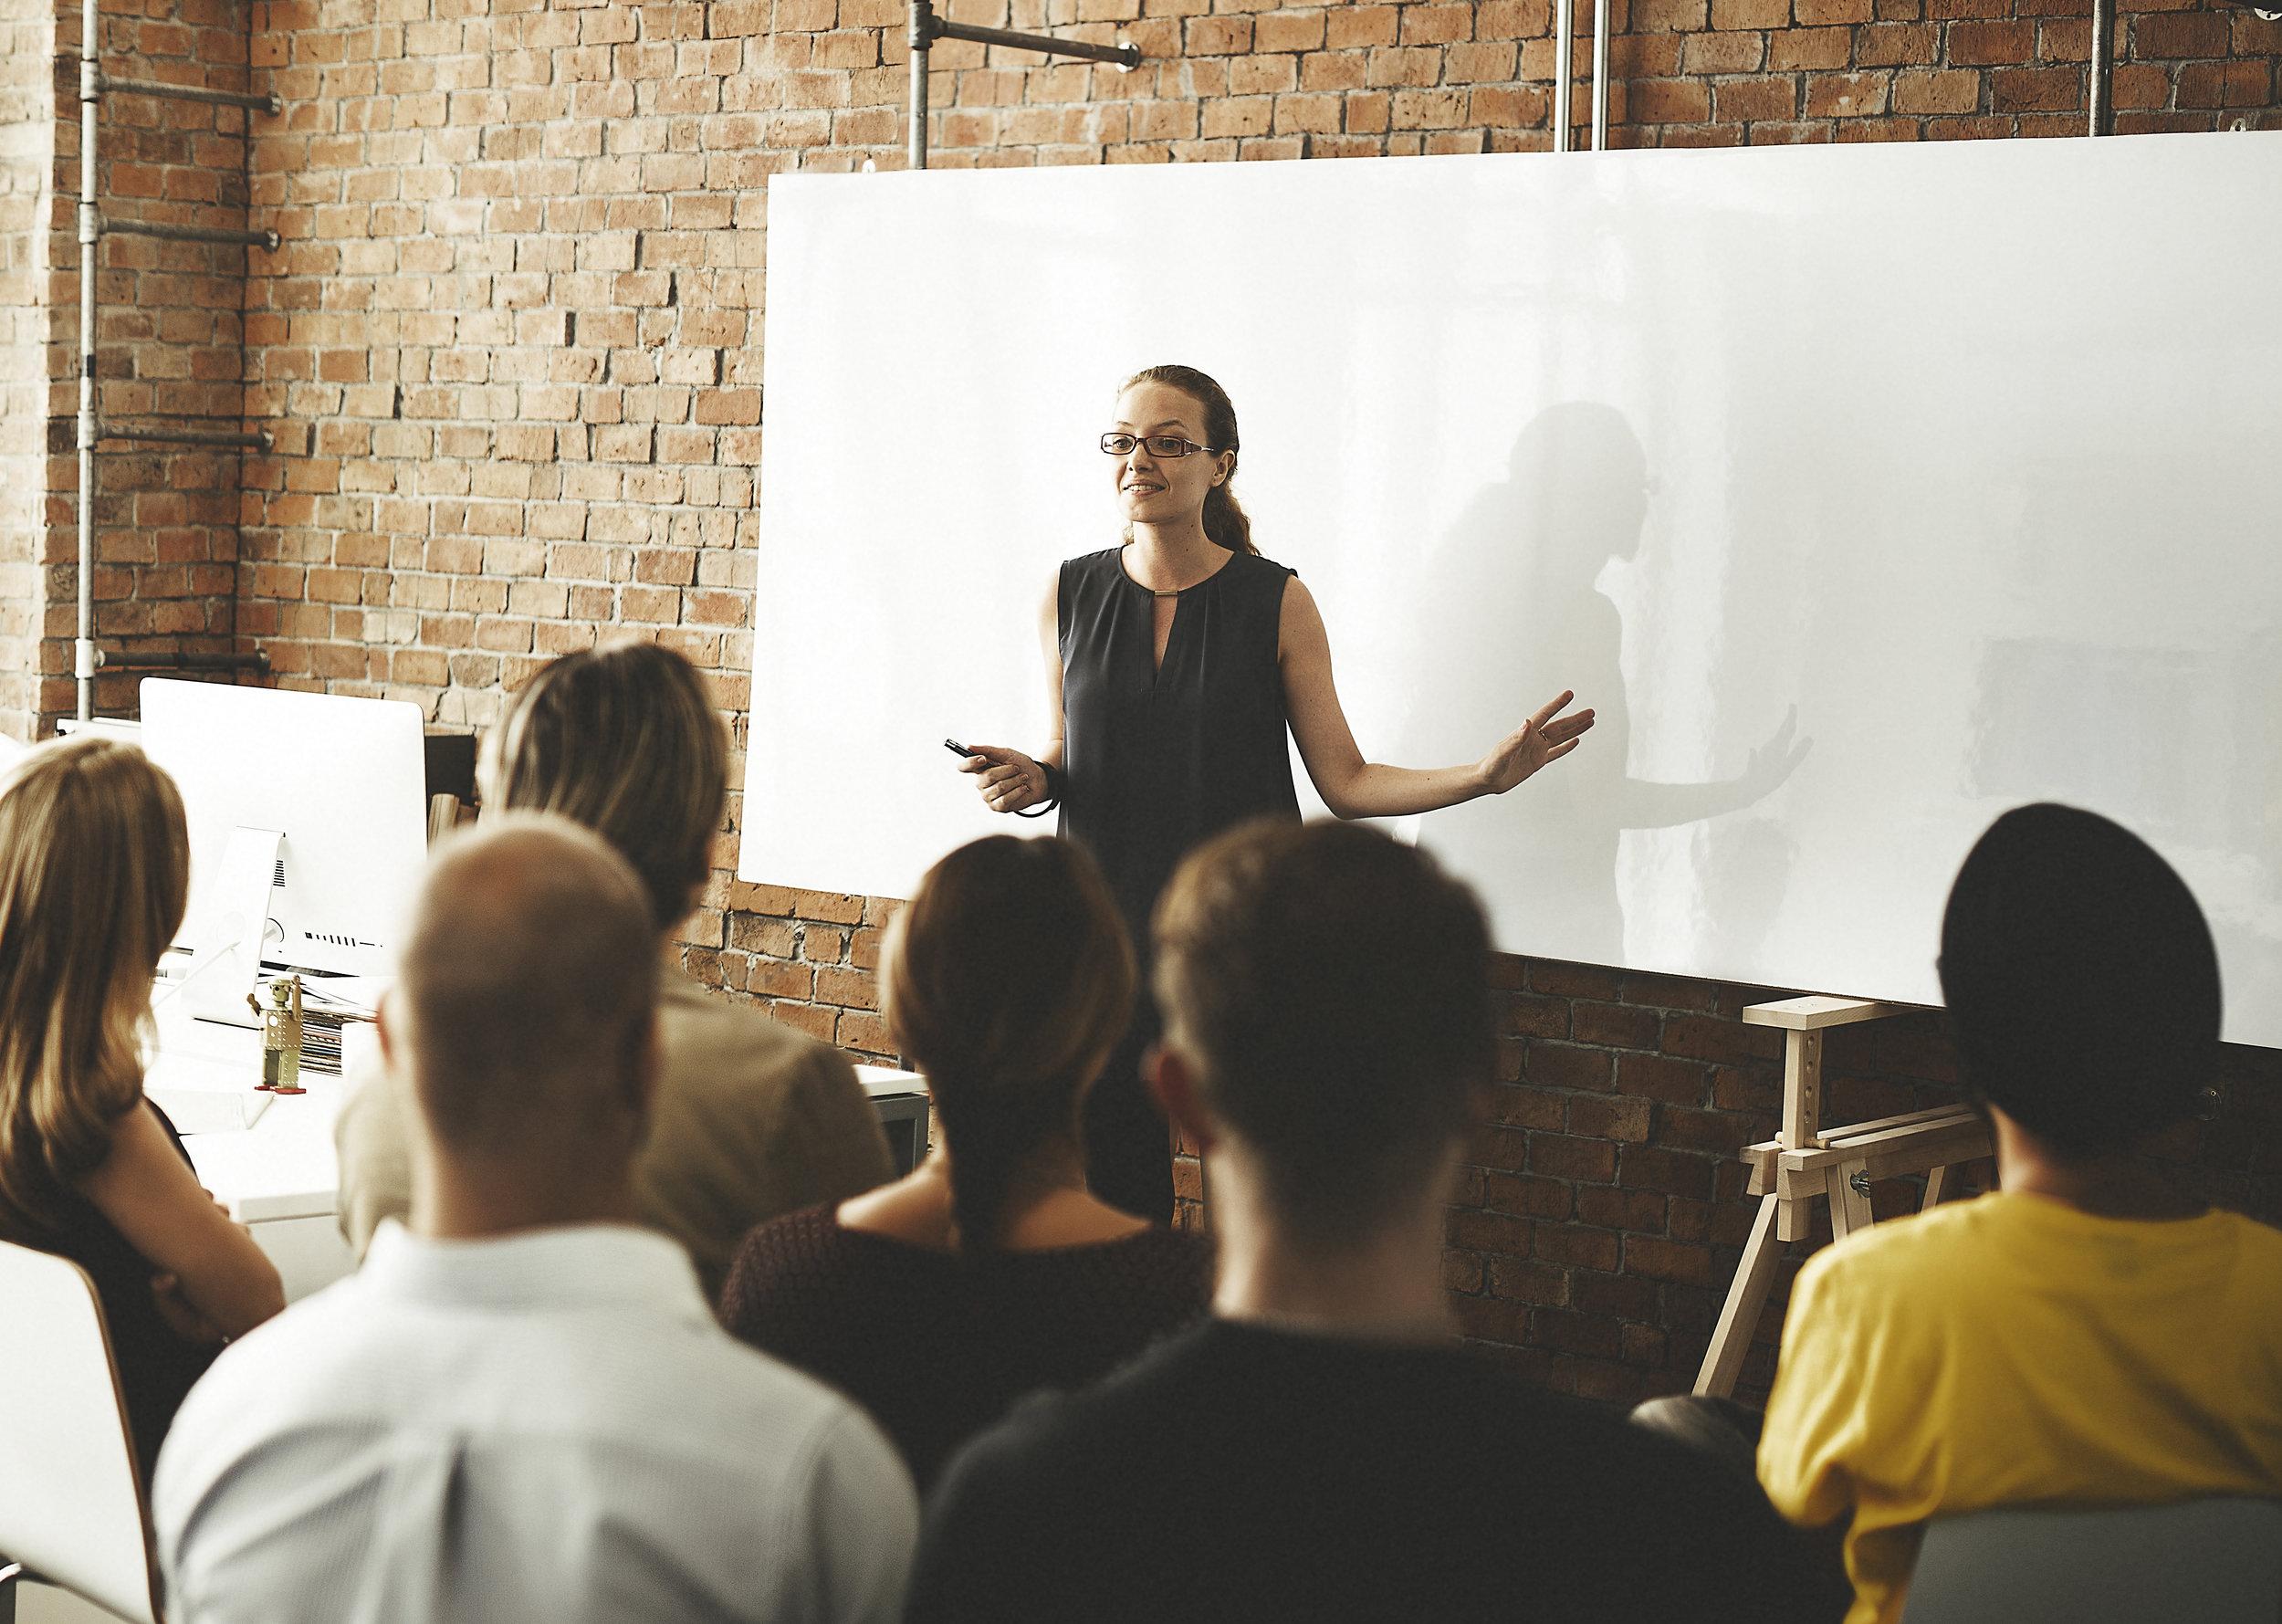 business-team-training-listening-meeting-concept-PVNQ42S.jpg